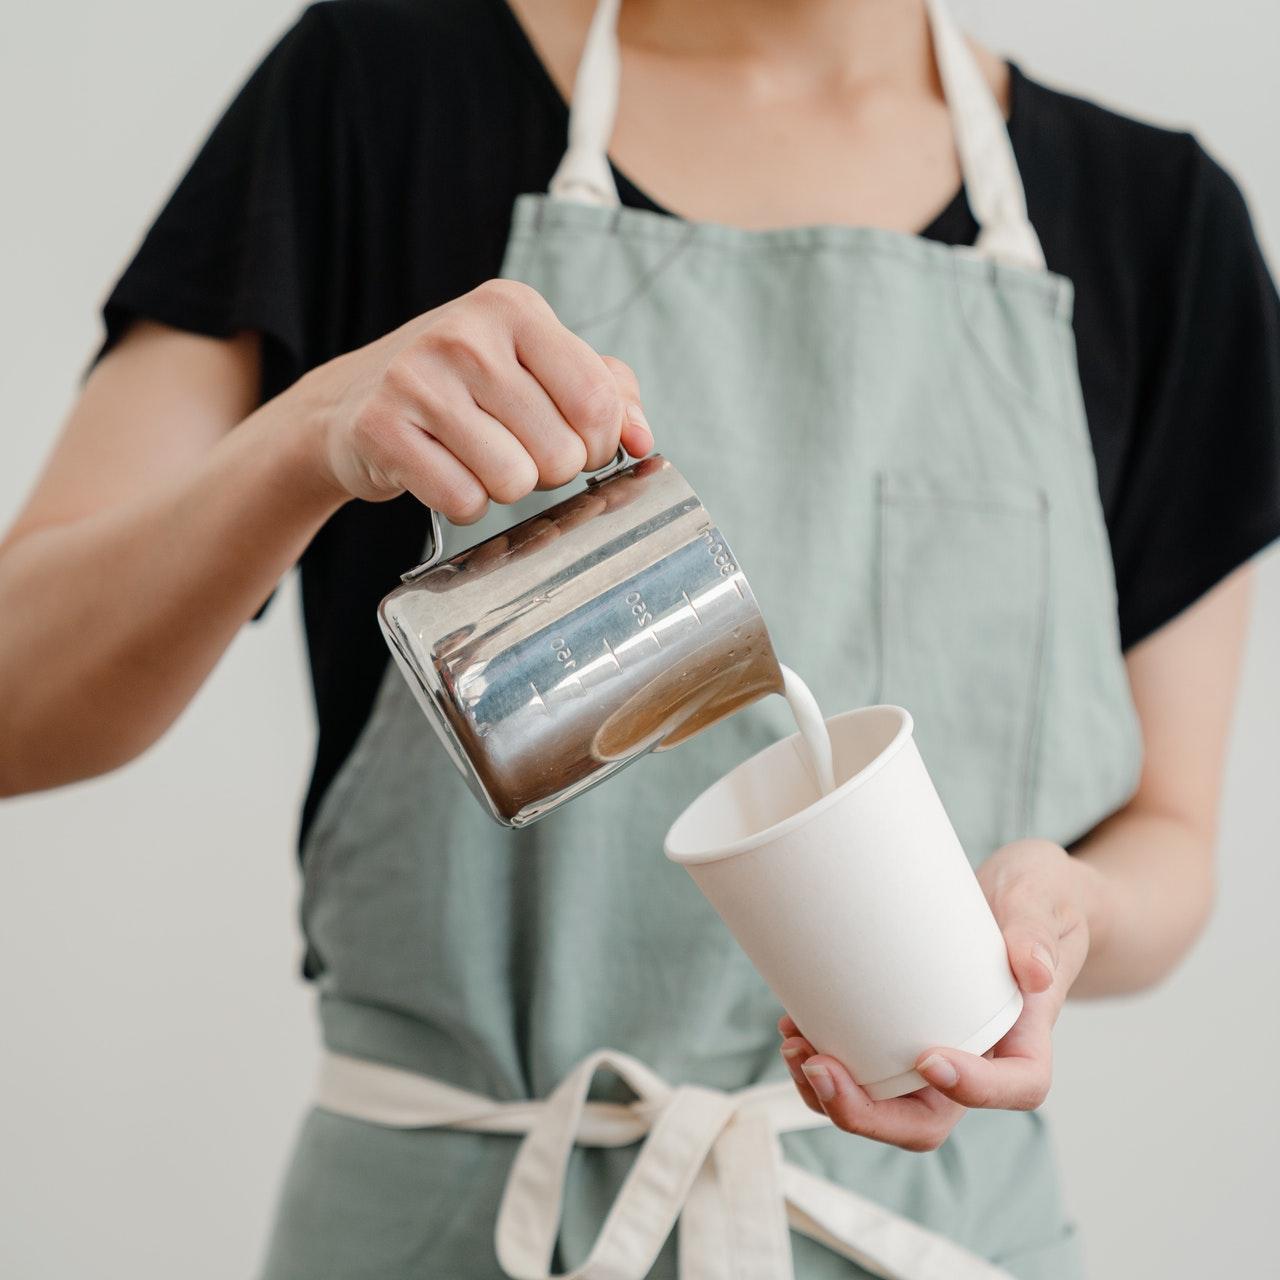 adding-milk-to-coffee